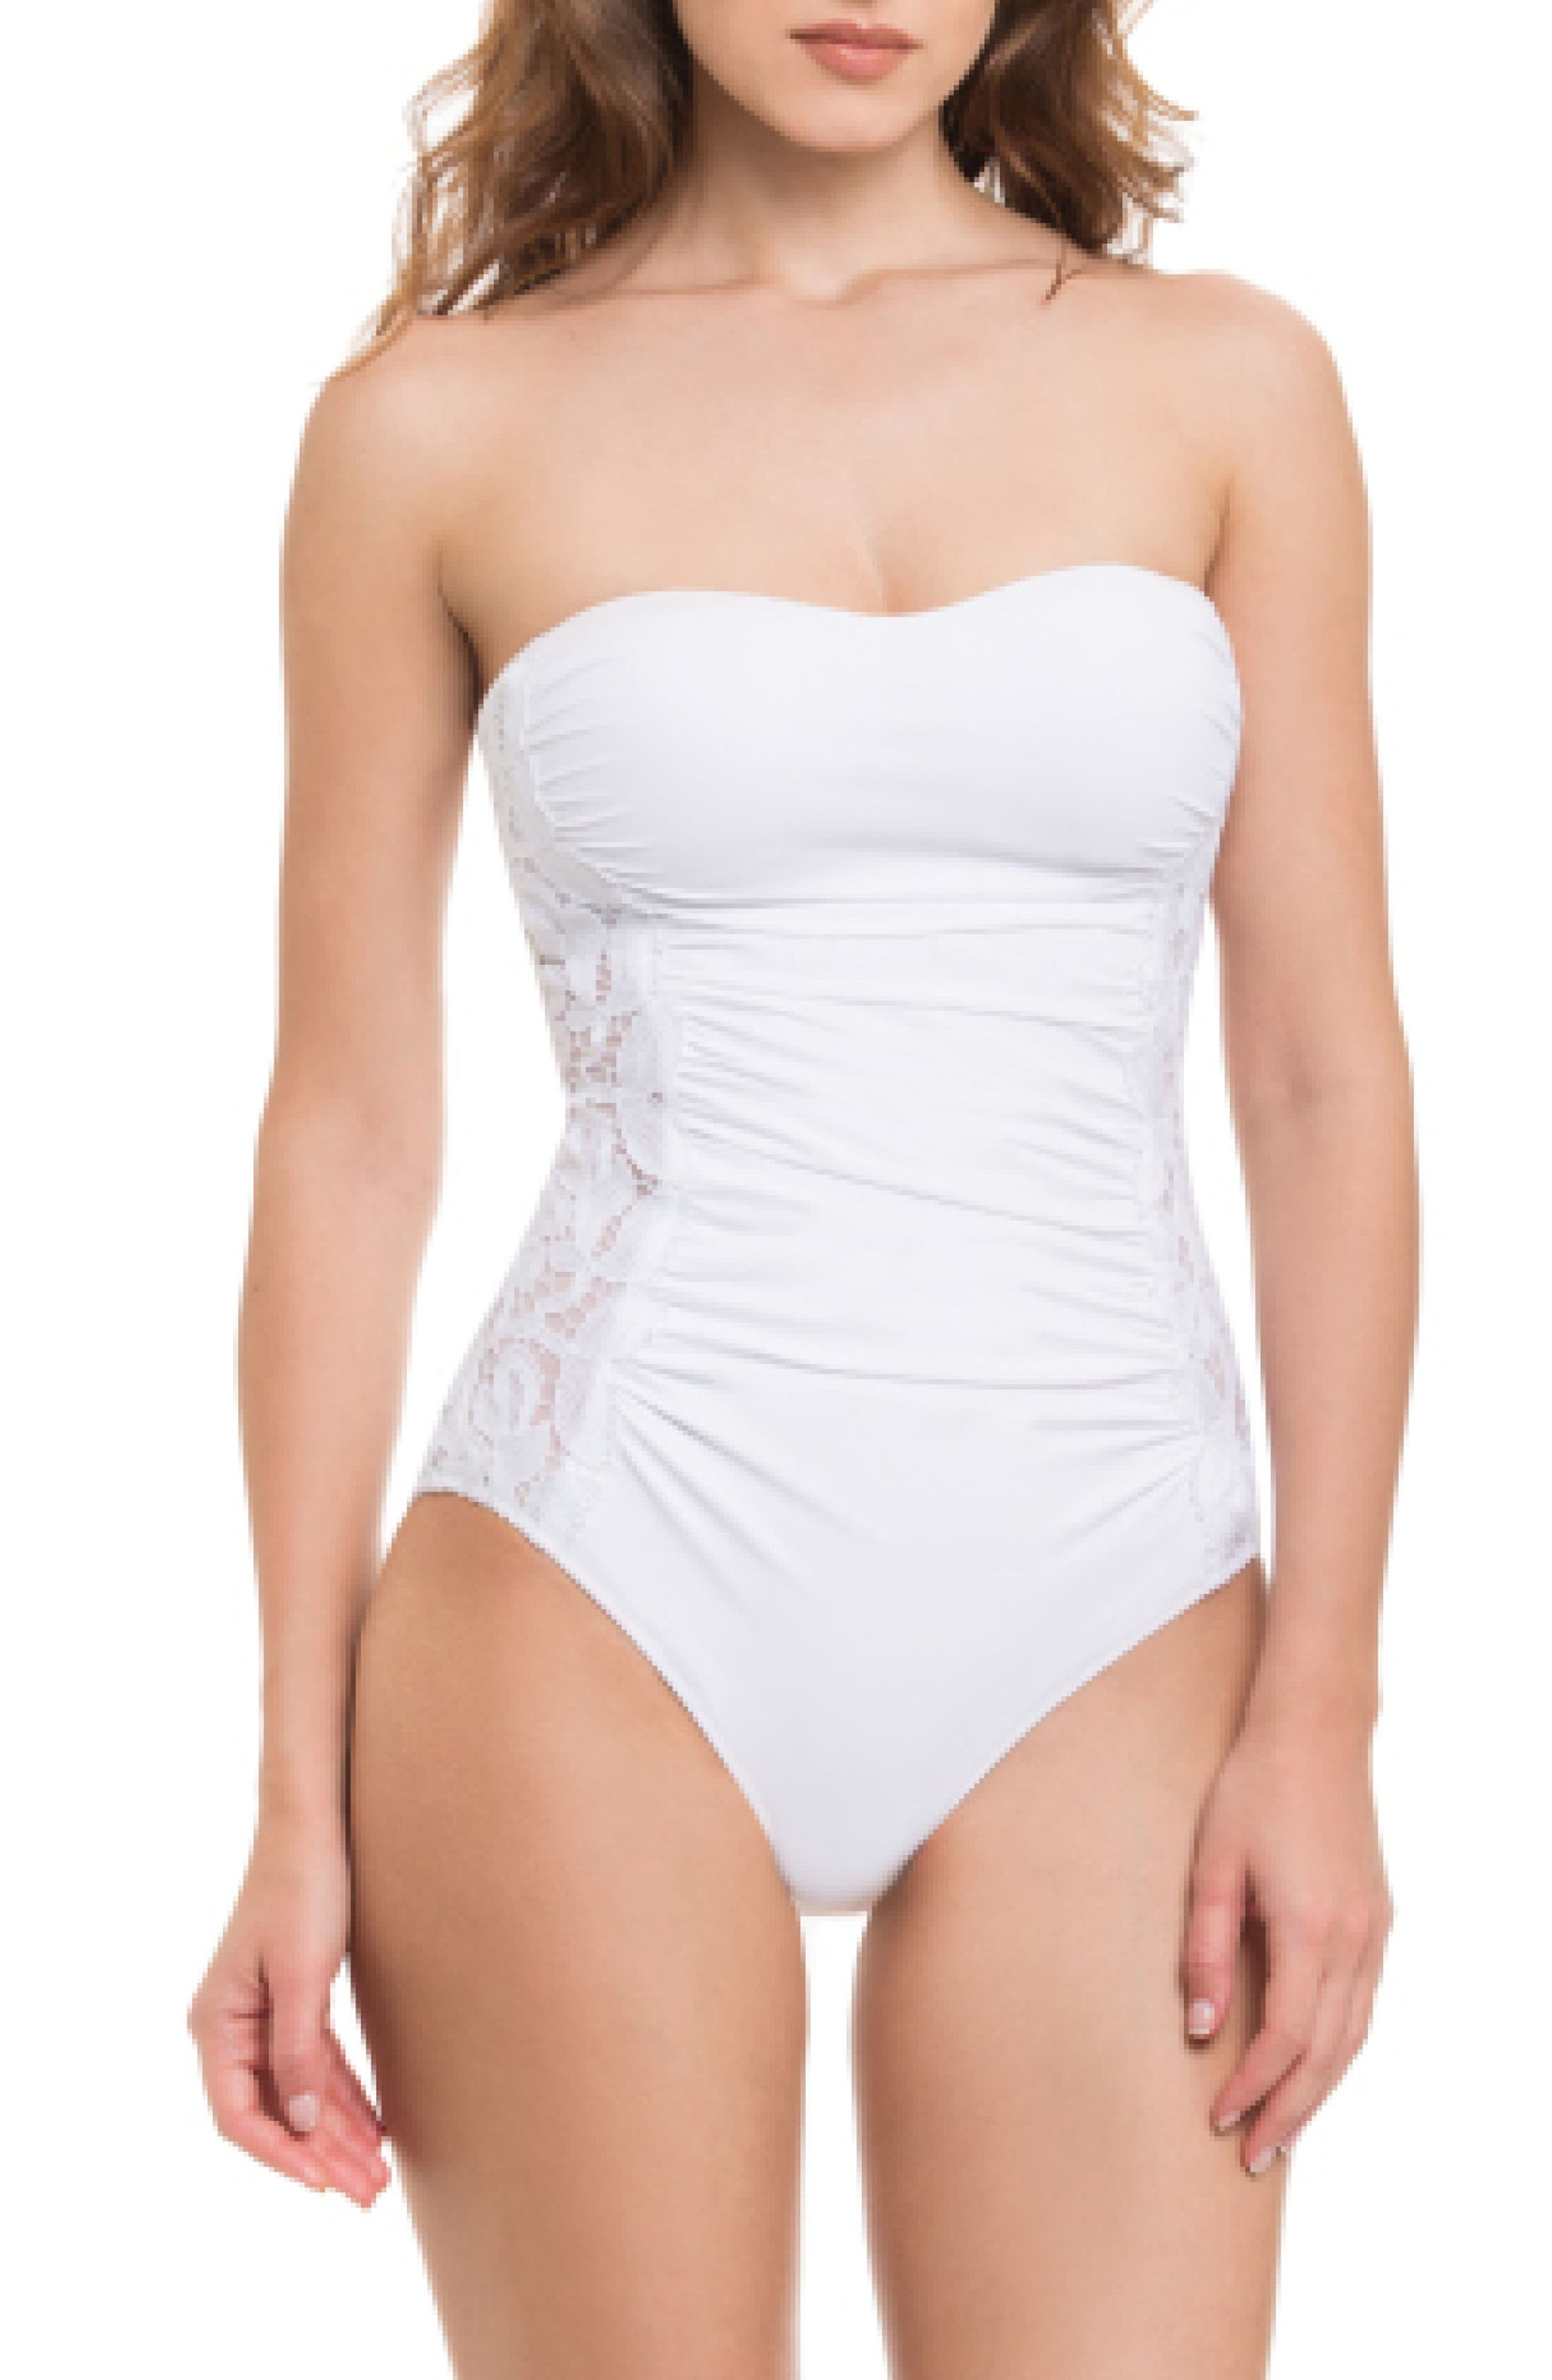 Main Image - Profile by Gottex Allure Bandeau One-Piece Swimsuit